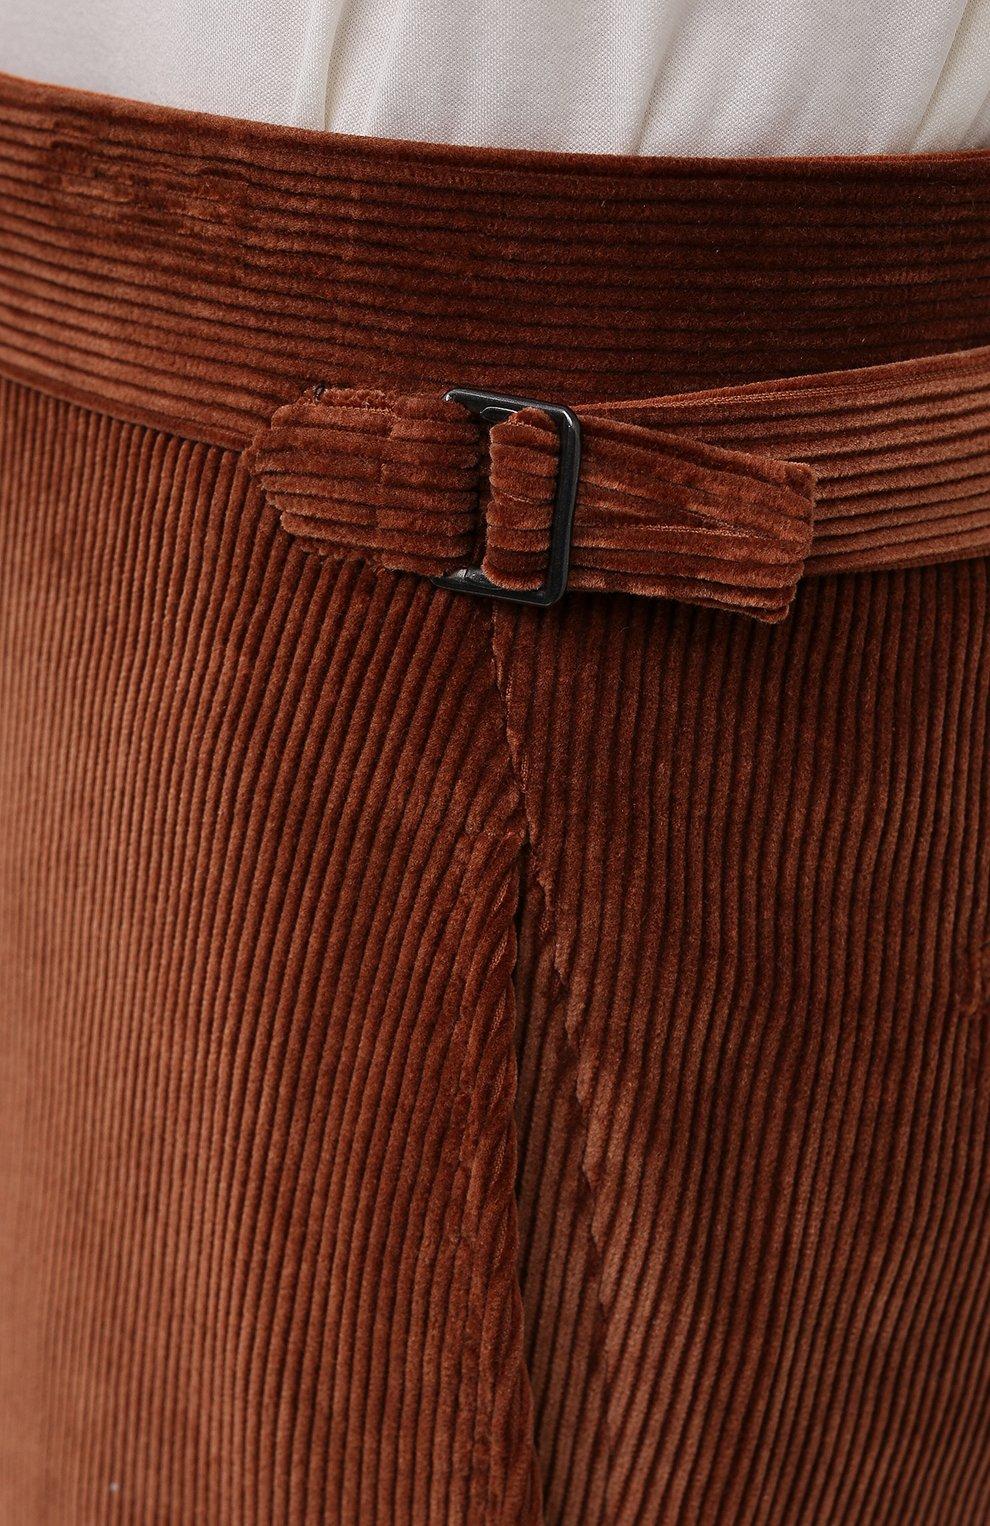 Мужские брюки TOM FORD коричневого цвета, арт. 2VER24/610041 | Фото 5